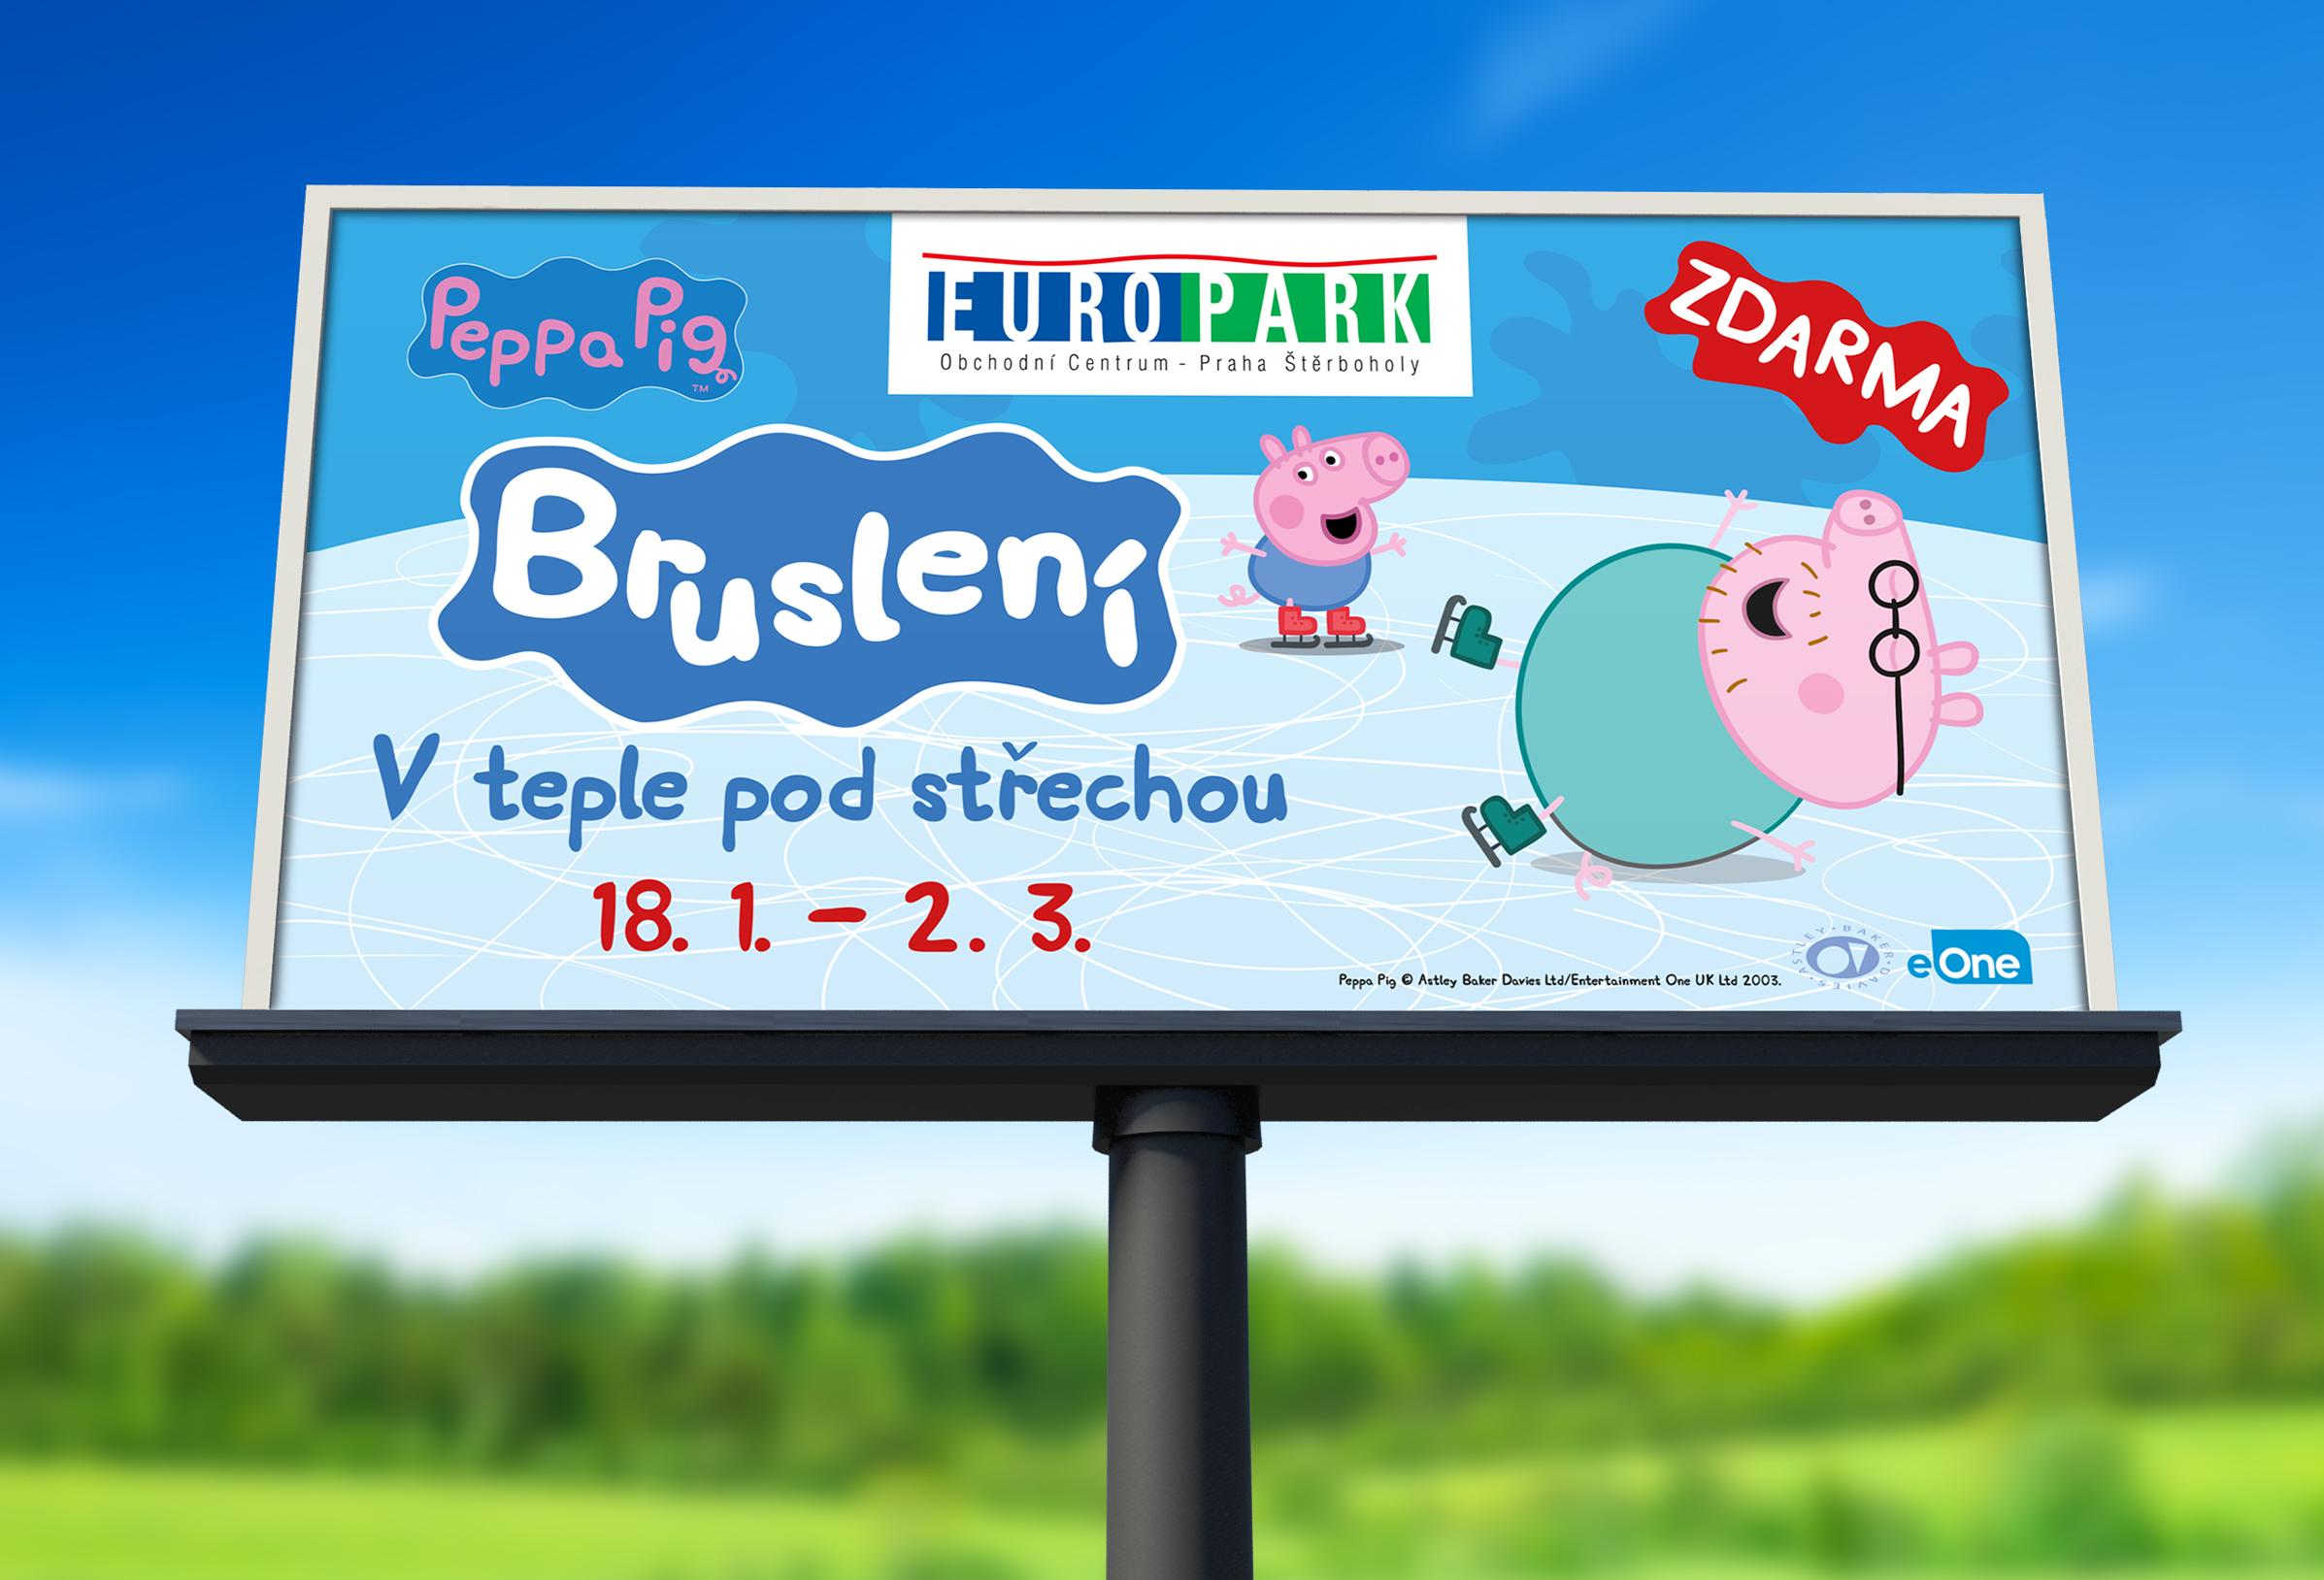 Outdoor kampaně Europark